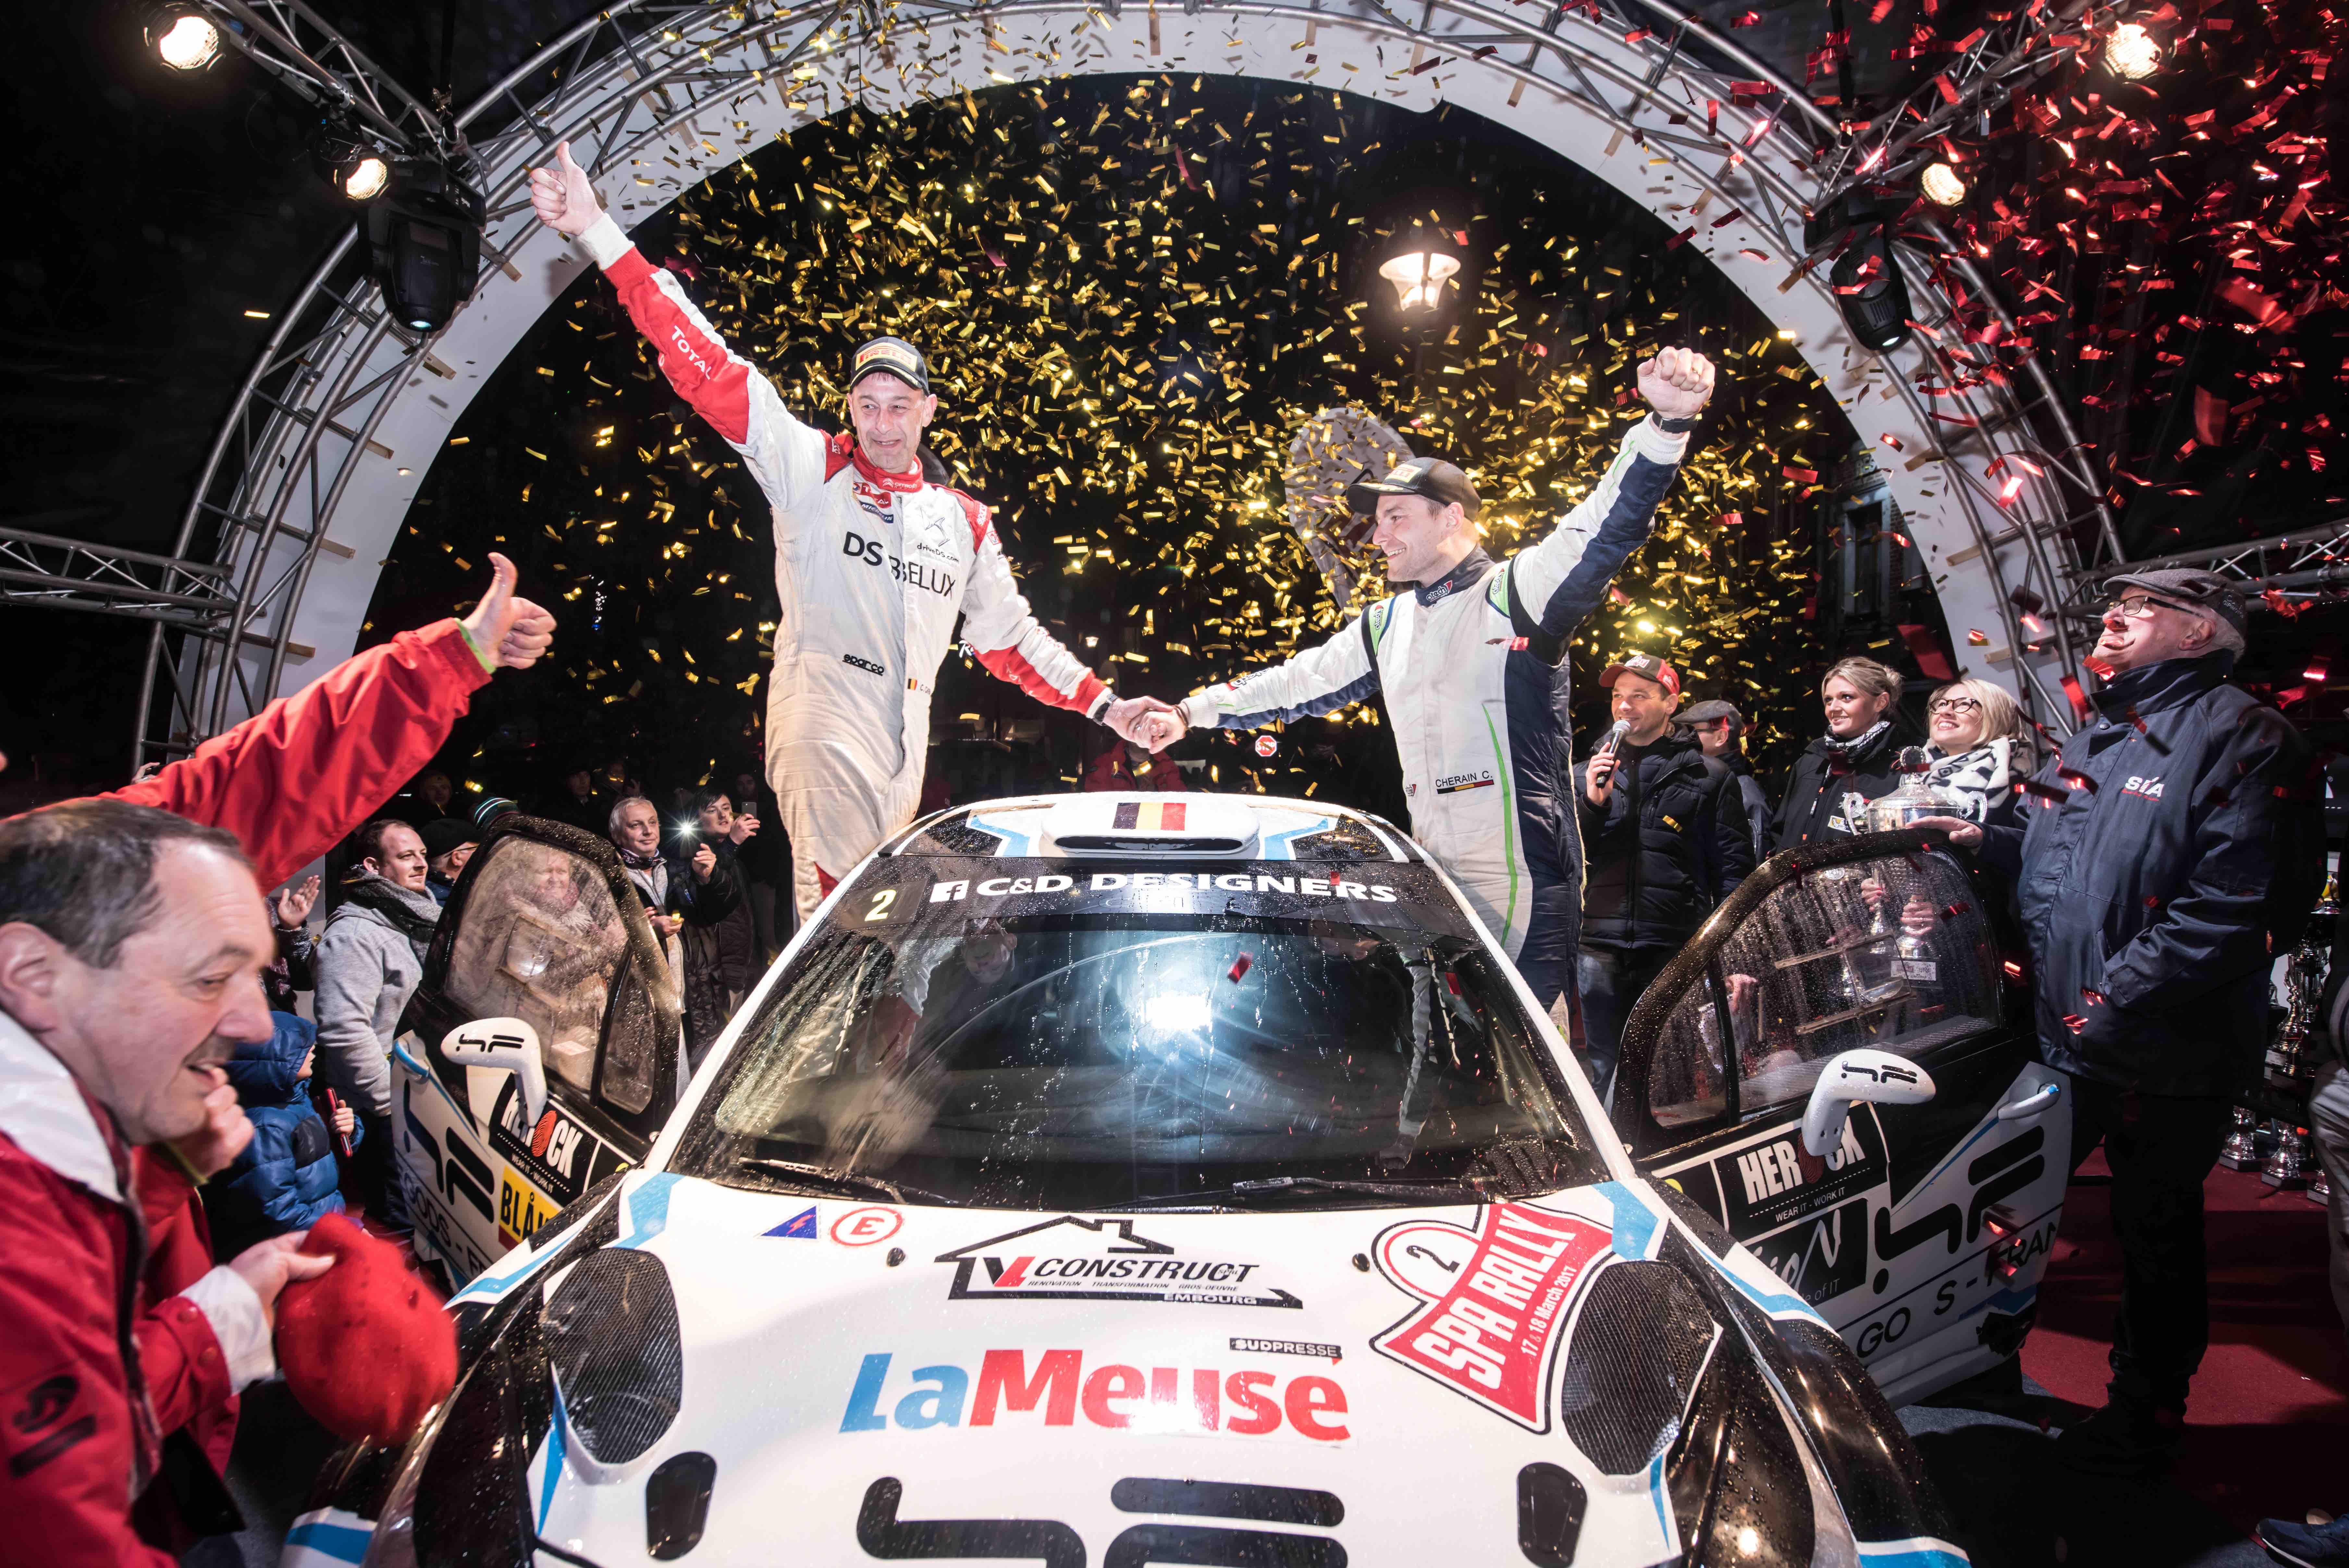 Cédric Cherain wint in extremis de Spa rally